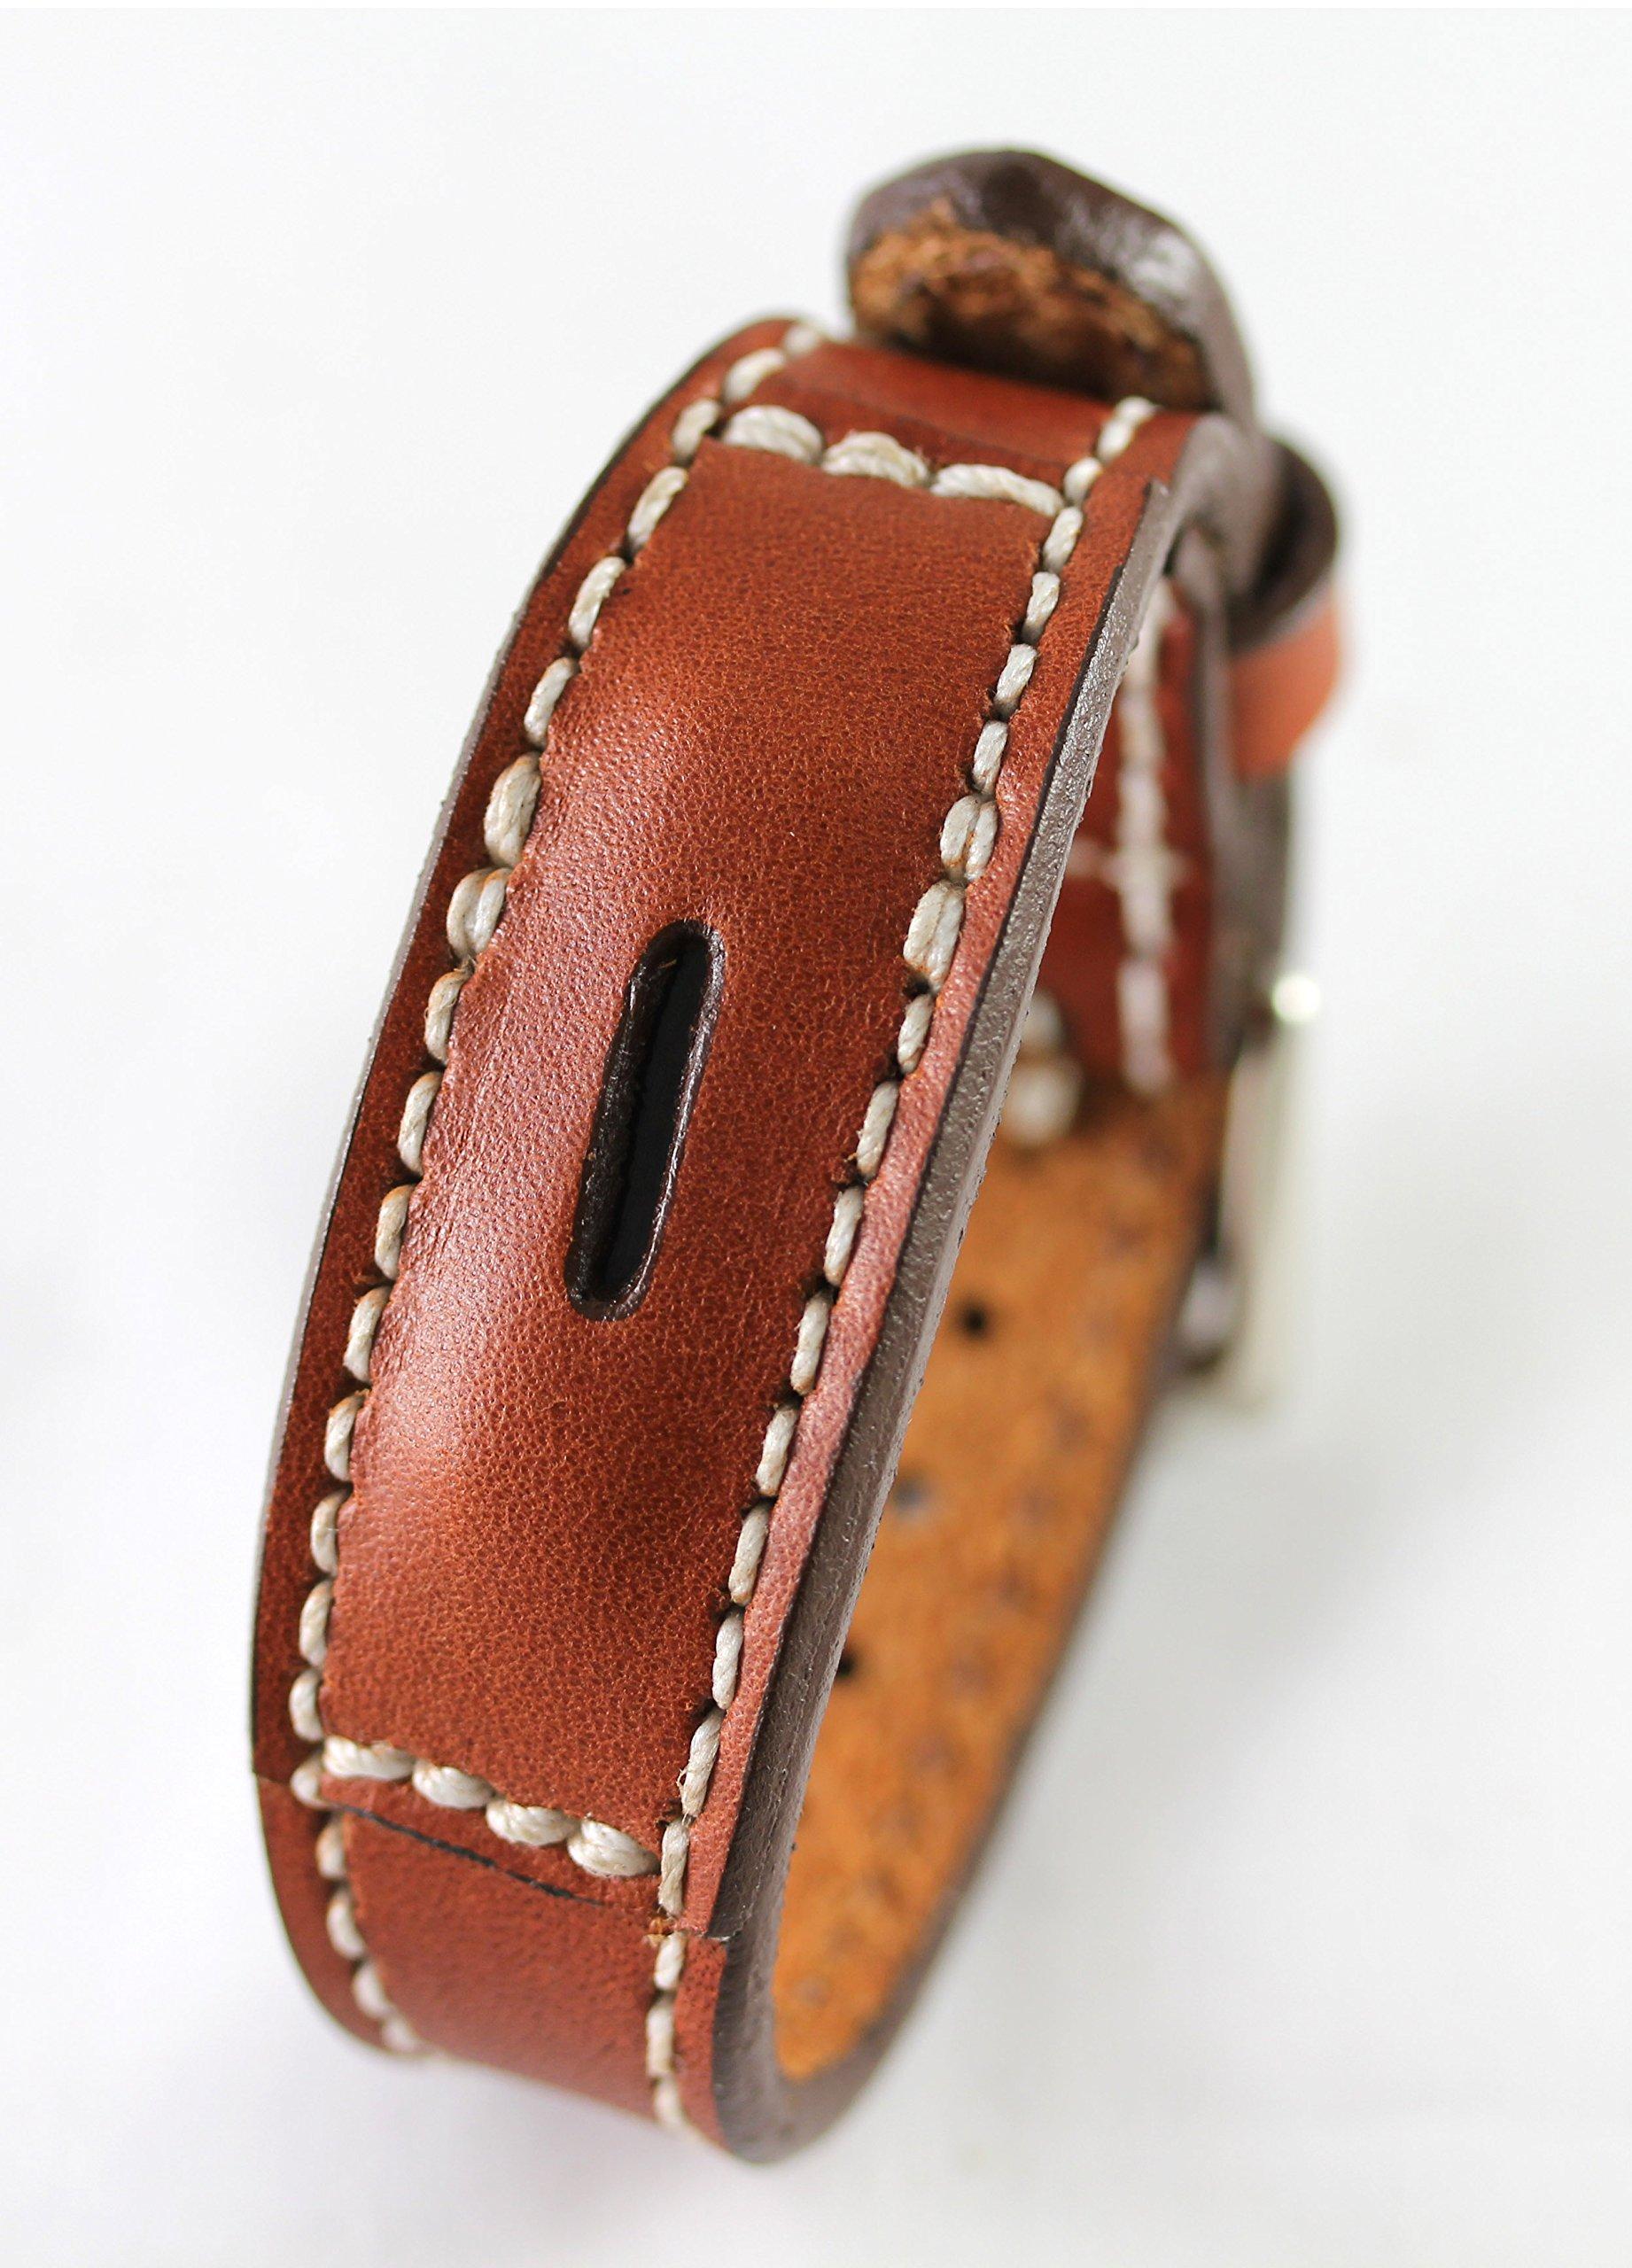 Fitbit Flex 2 Real Leather Band - Replacement Band For Fitbit Flex 2 - Full Grain Fit Bit Flex band (Cognac, X-Large) by Desantis Leather Goods